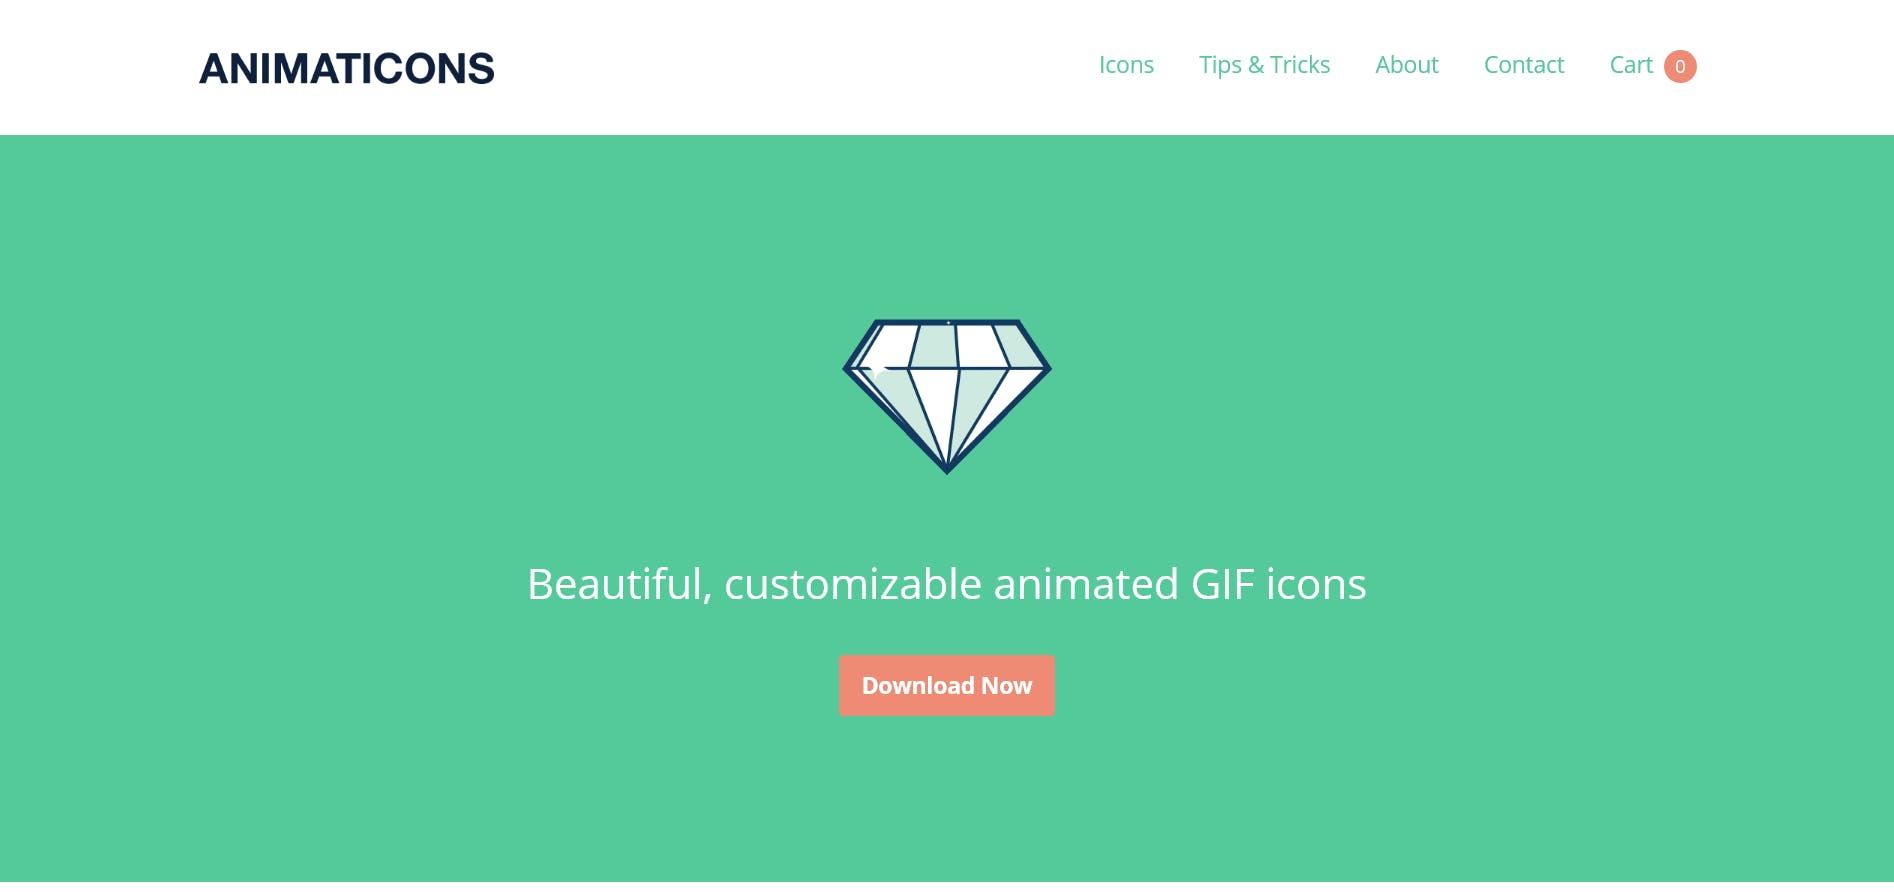 Screenshot 2021-04-30 at 07-51-59 Animaticons - Beautiful, customizable animated GIF icons.png